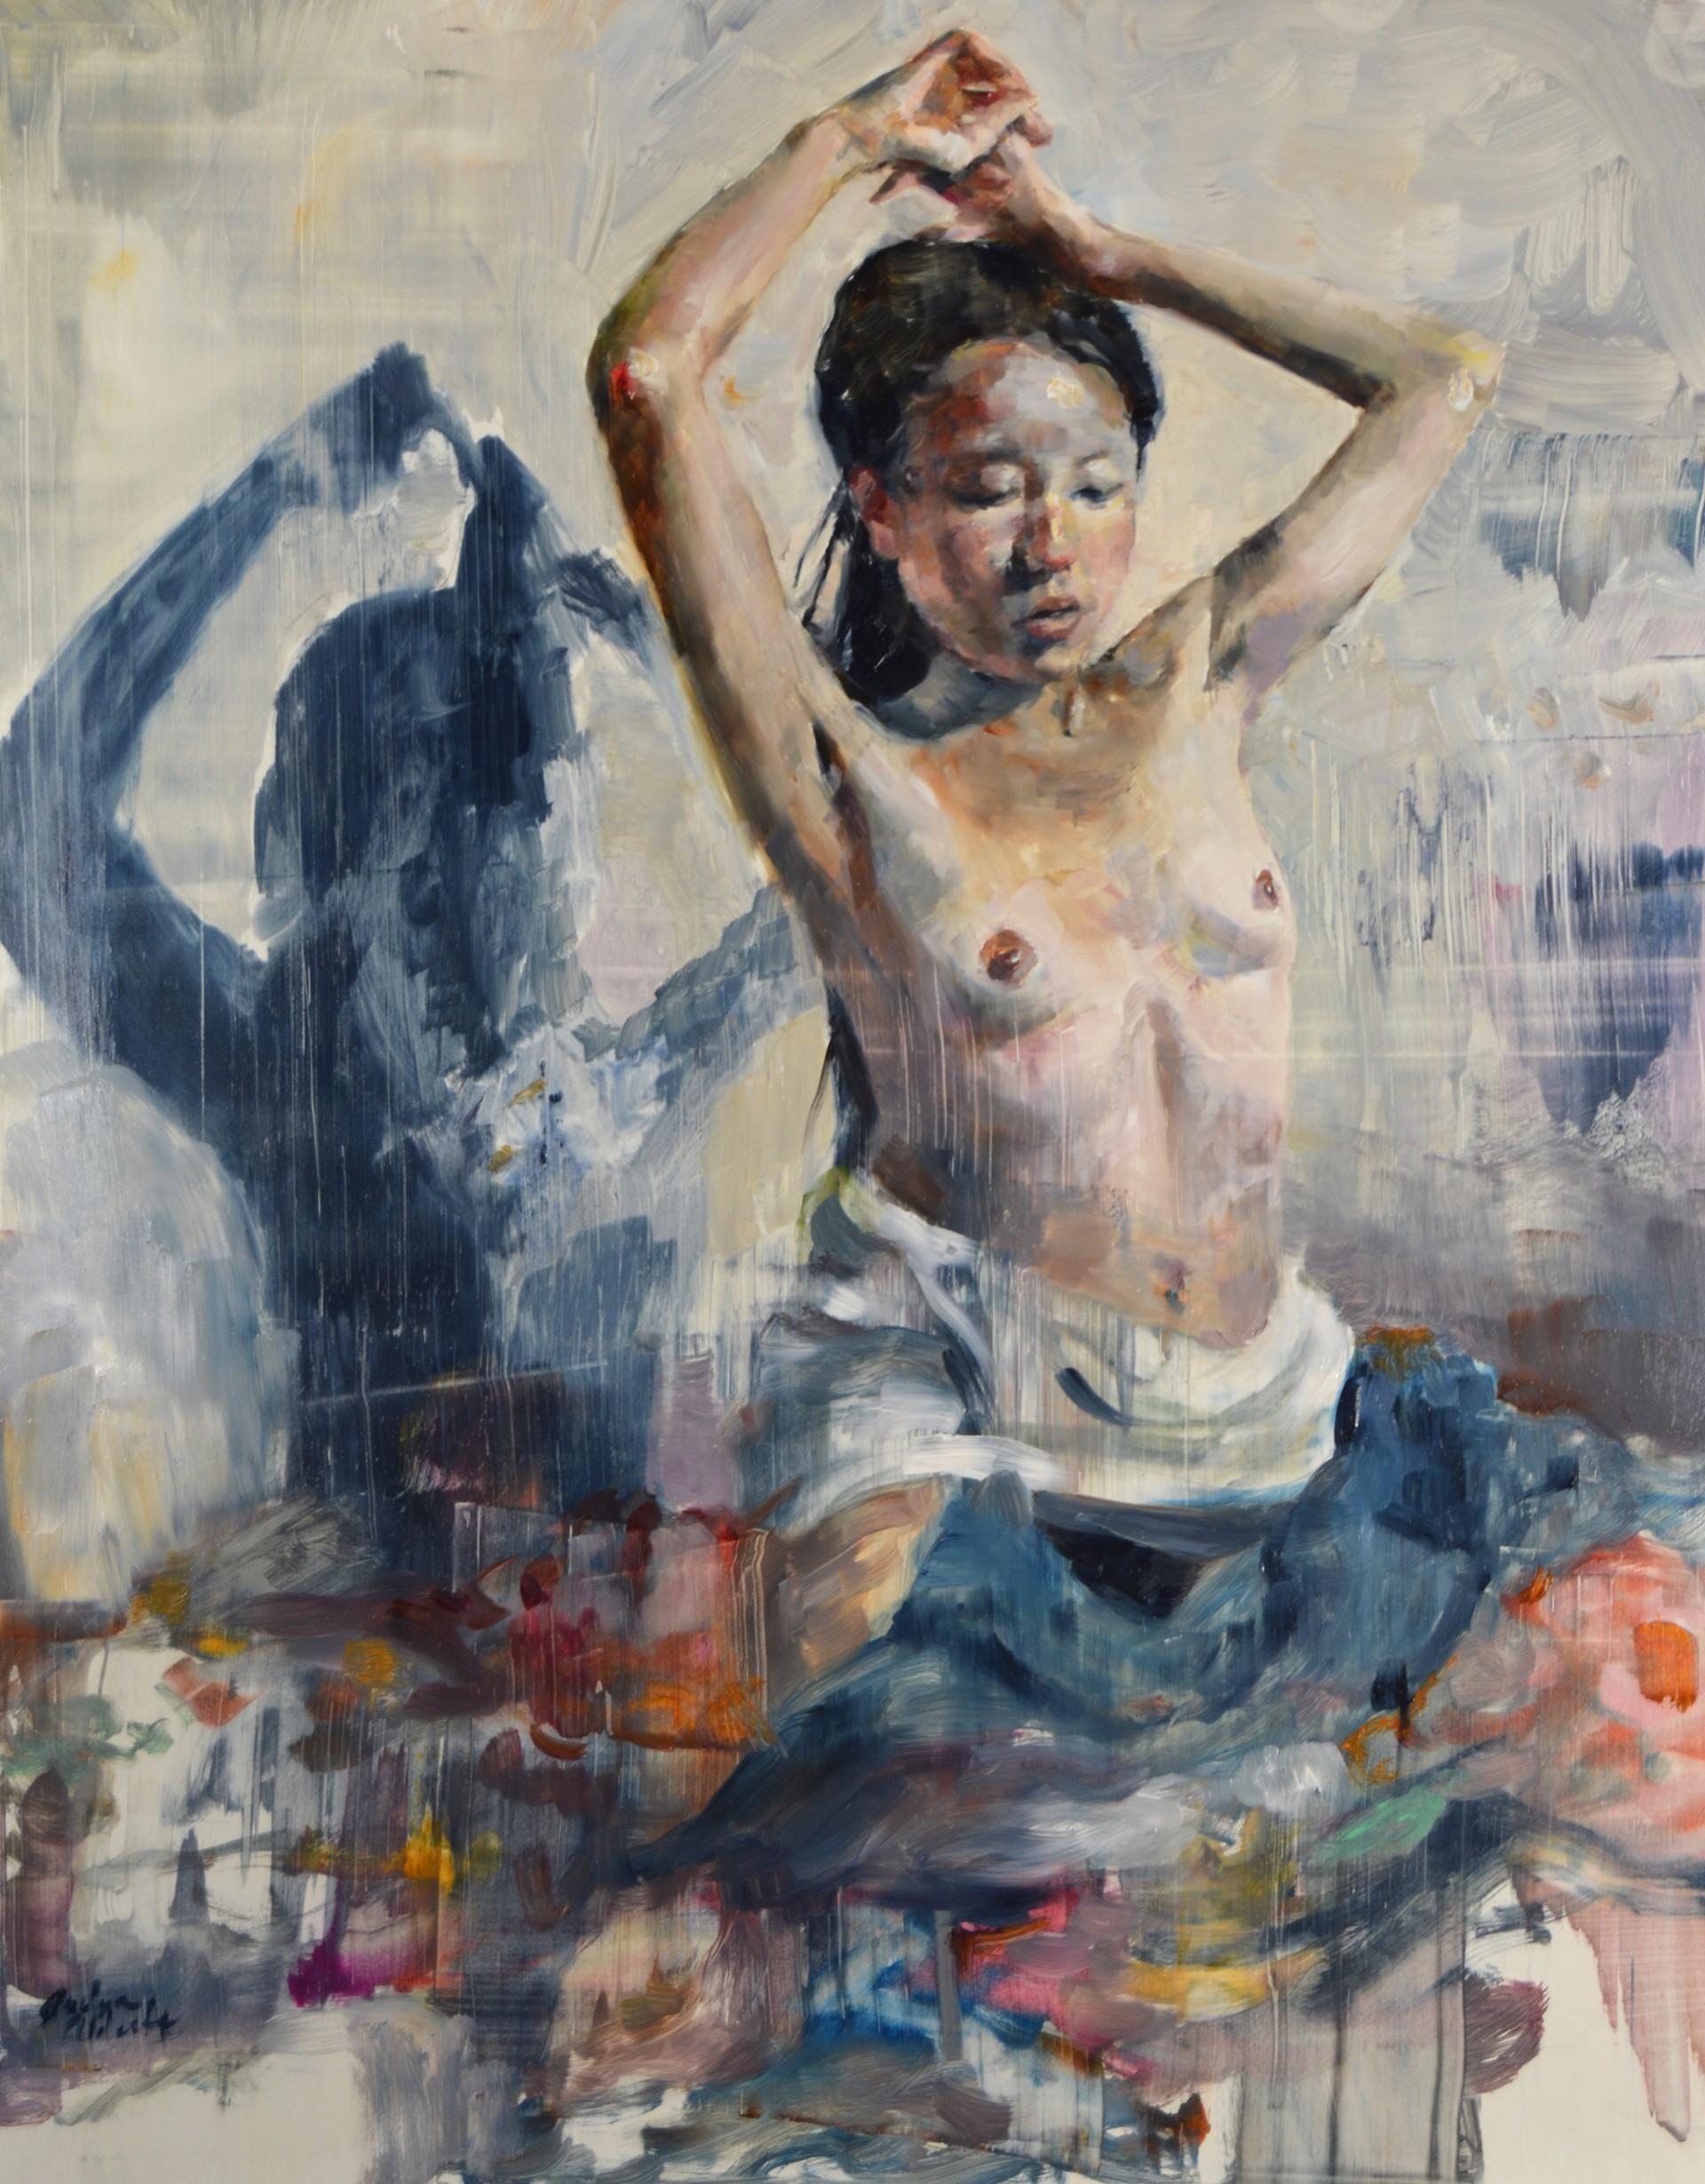 Umbra by Jaclyn Alderete